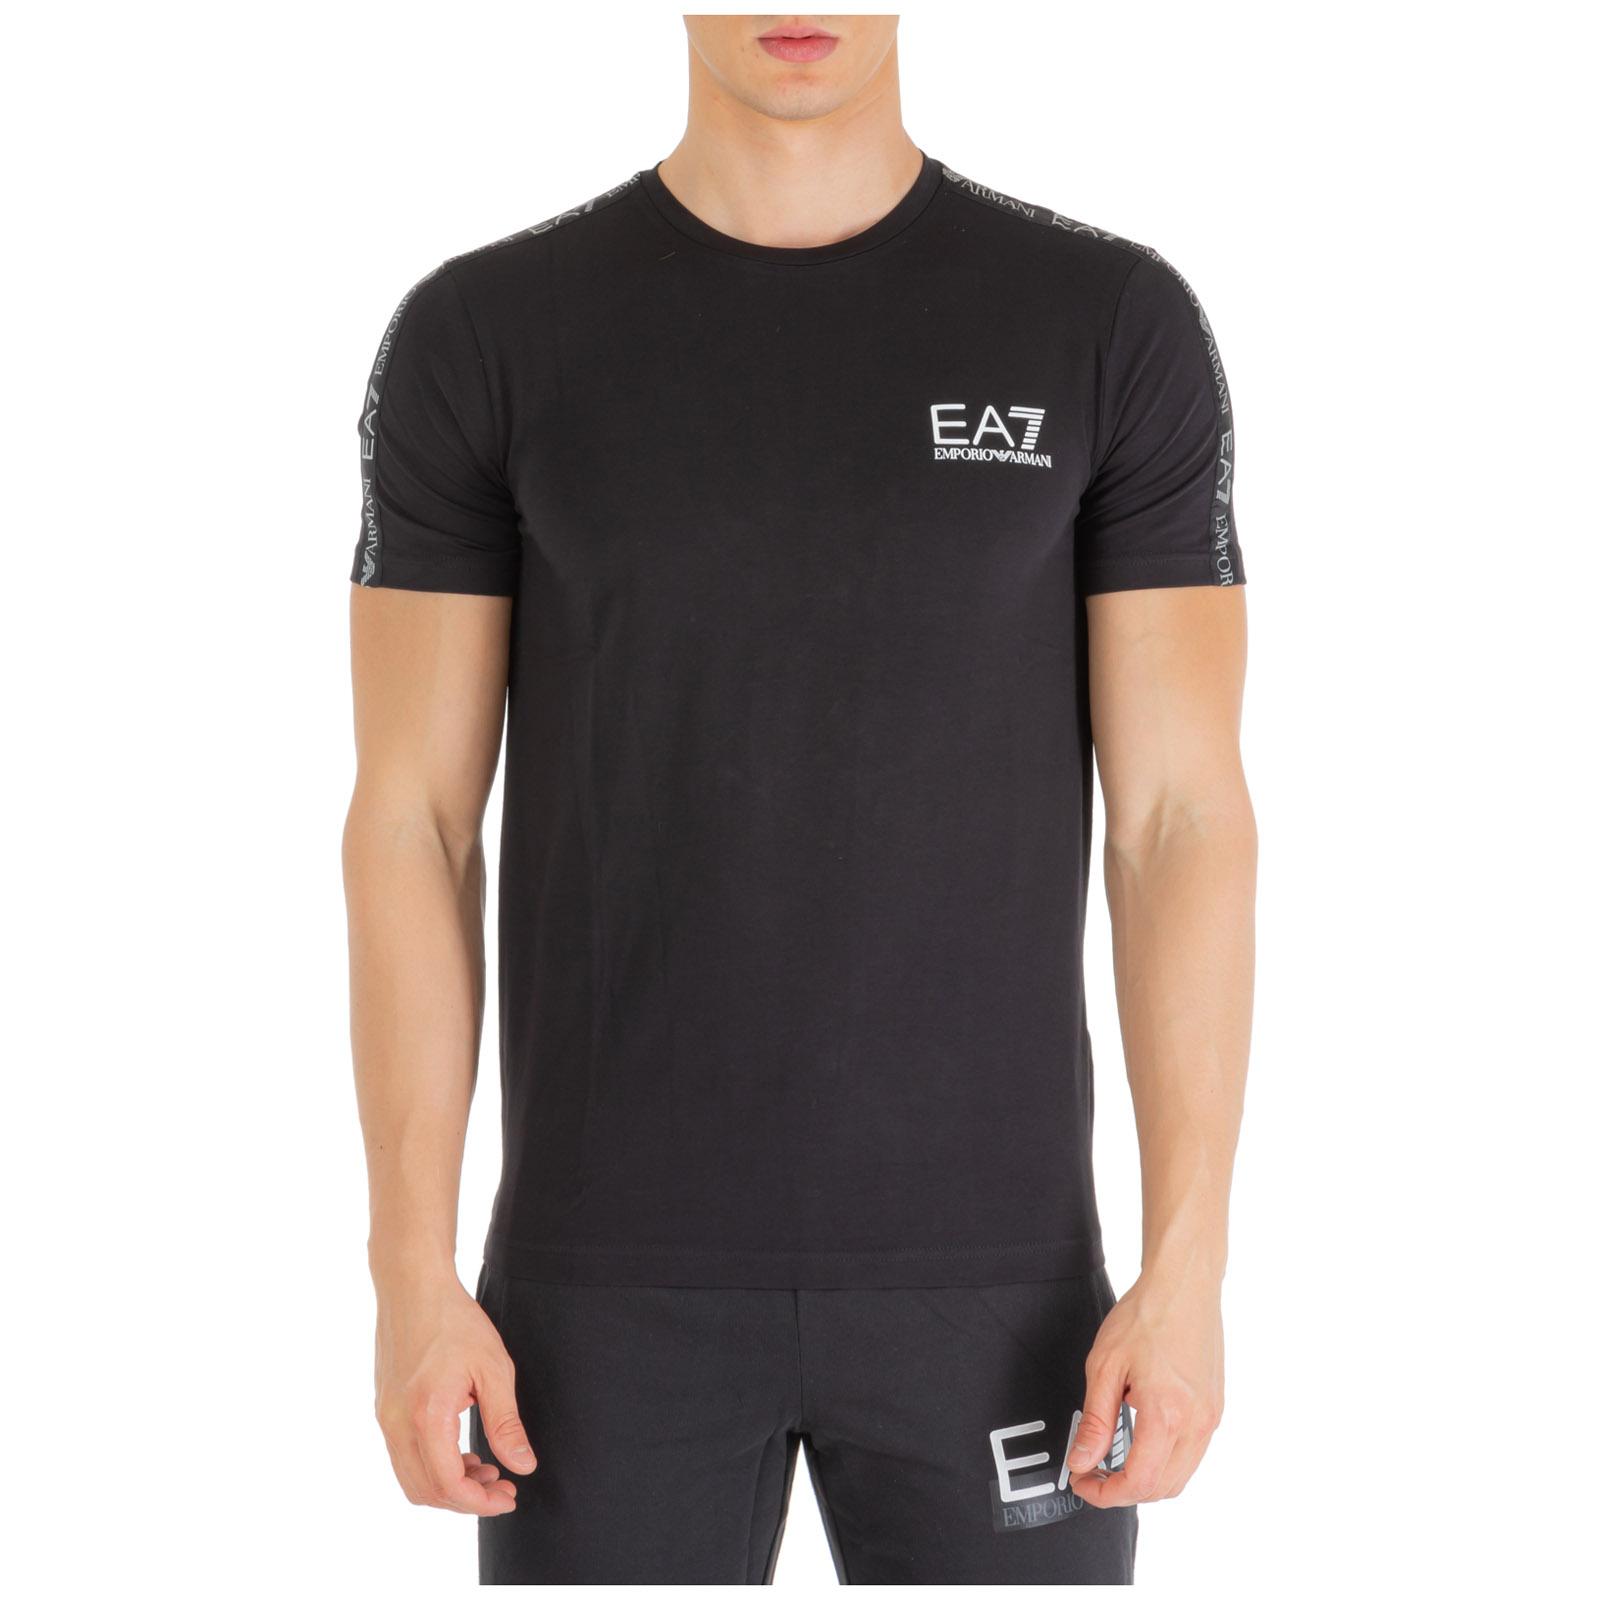 T-shirt Emporio Armani EA7 6GPT13PJ20Z120